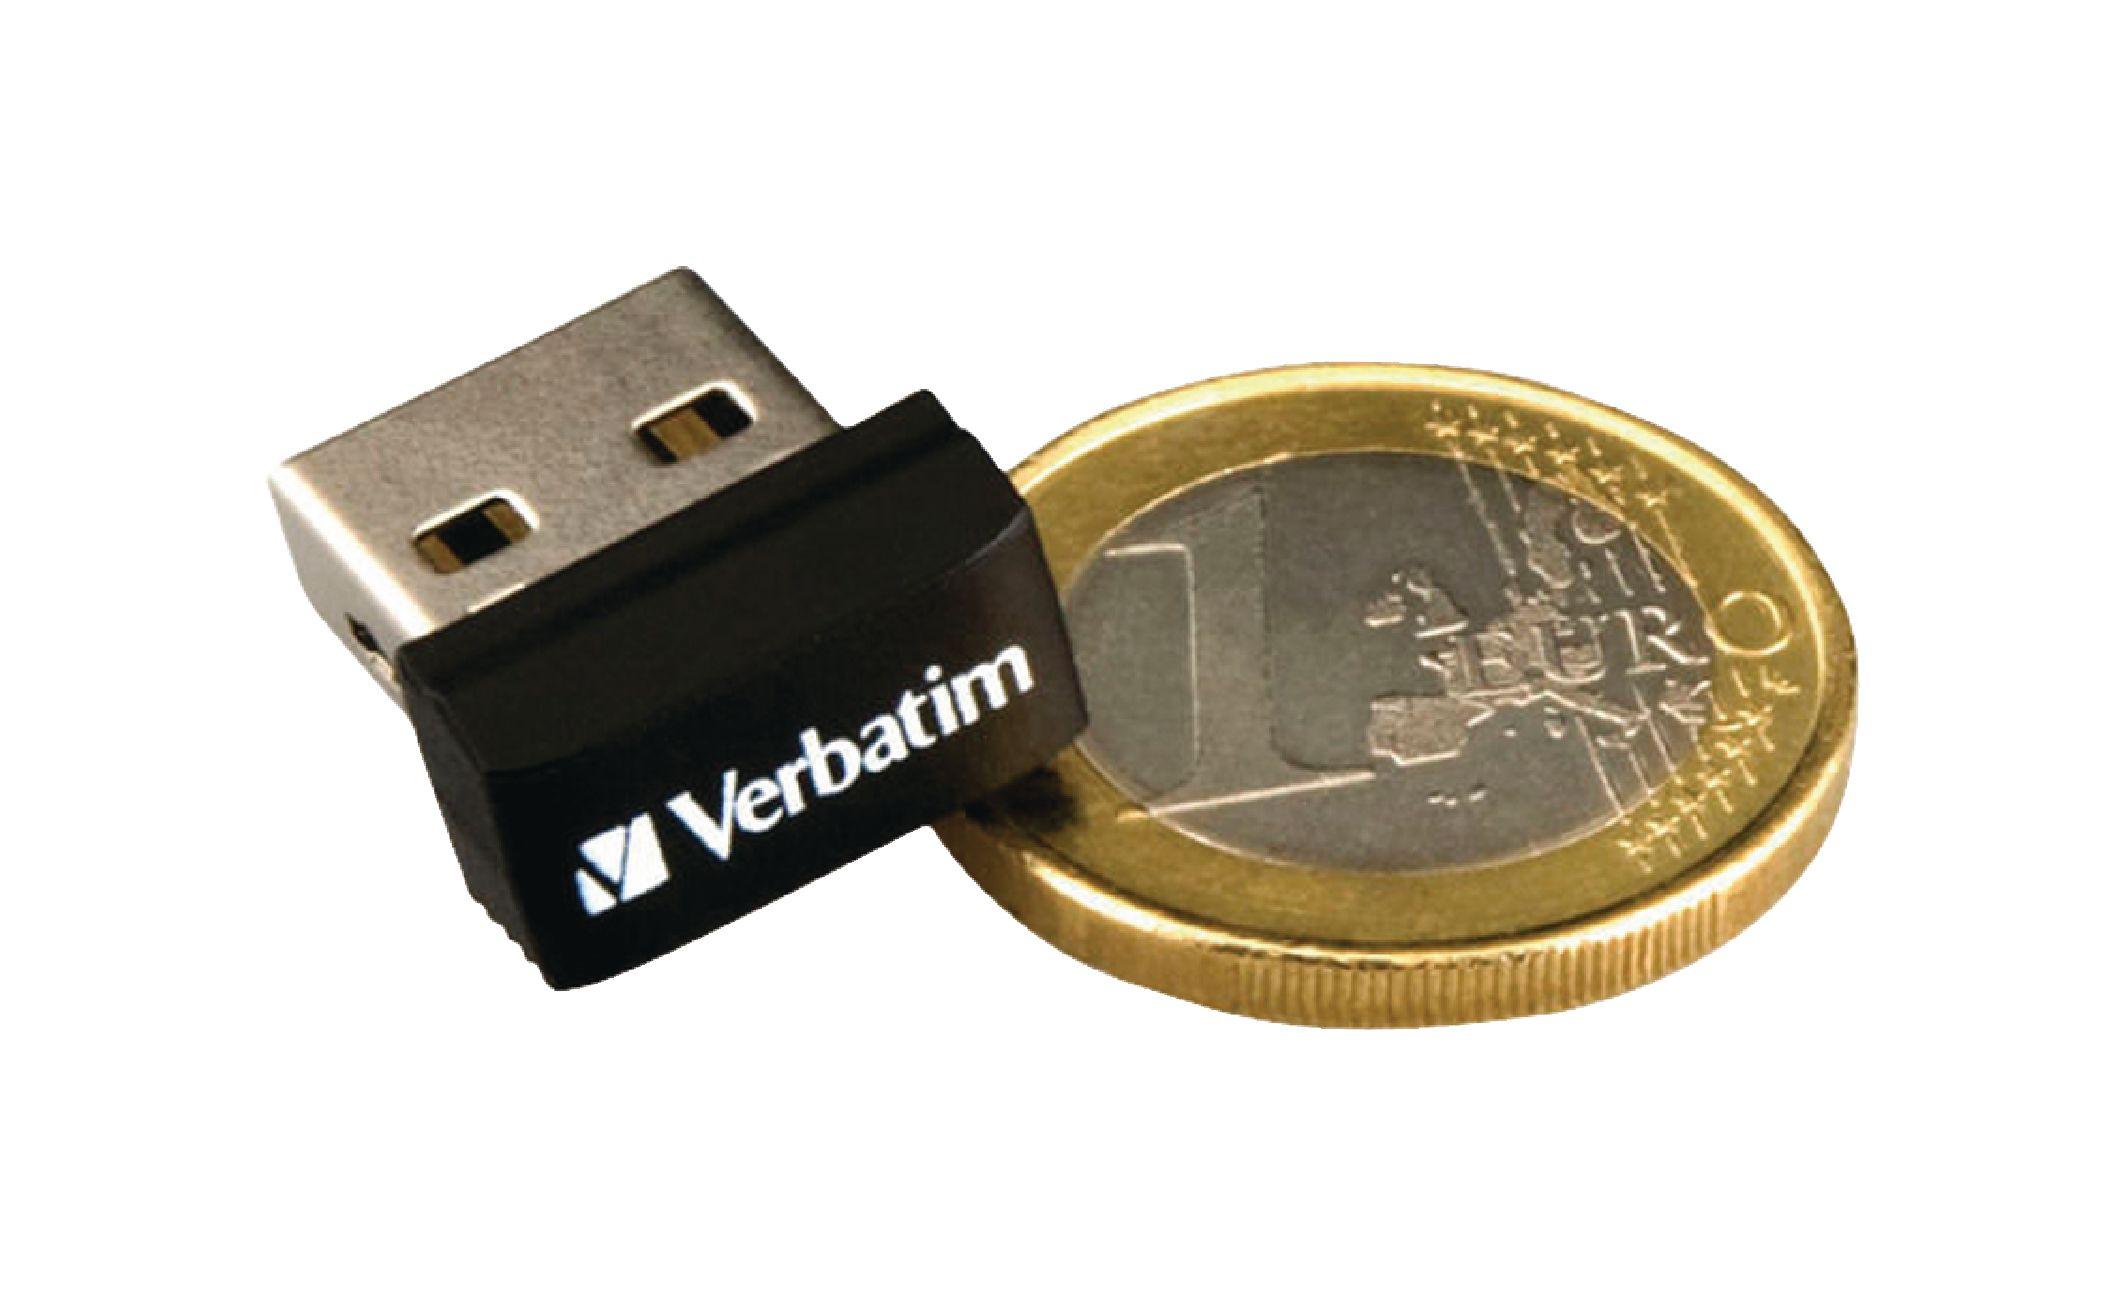 Vebatim nano flash disk USB 2.0 16 GB